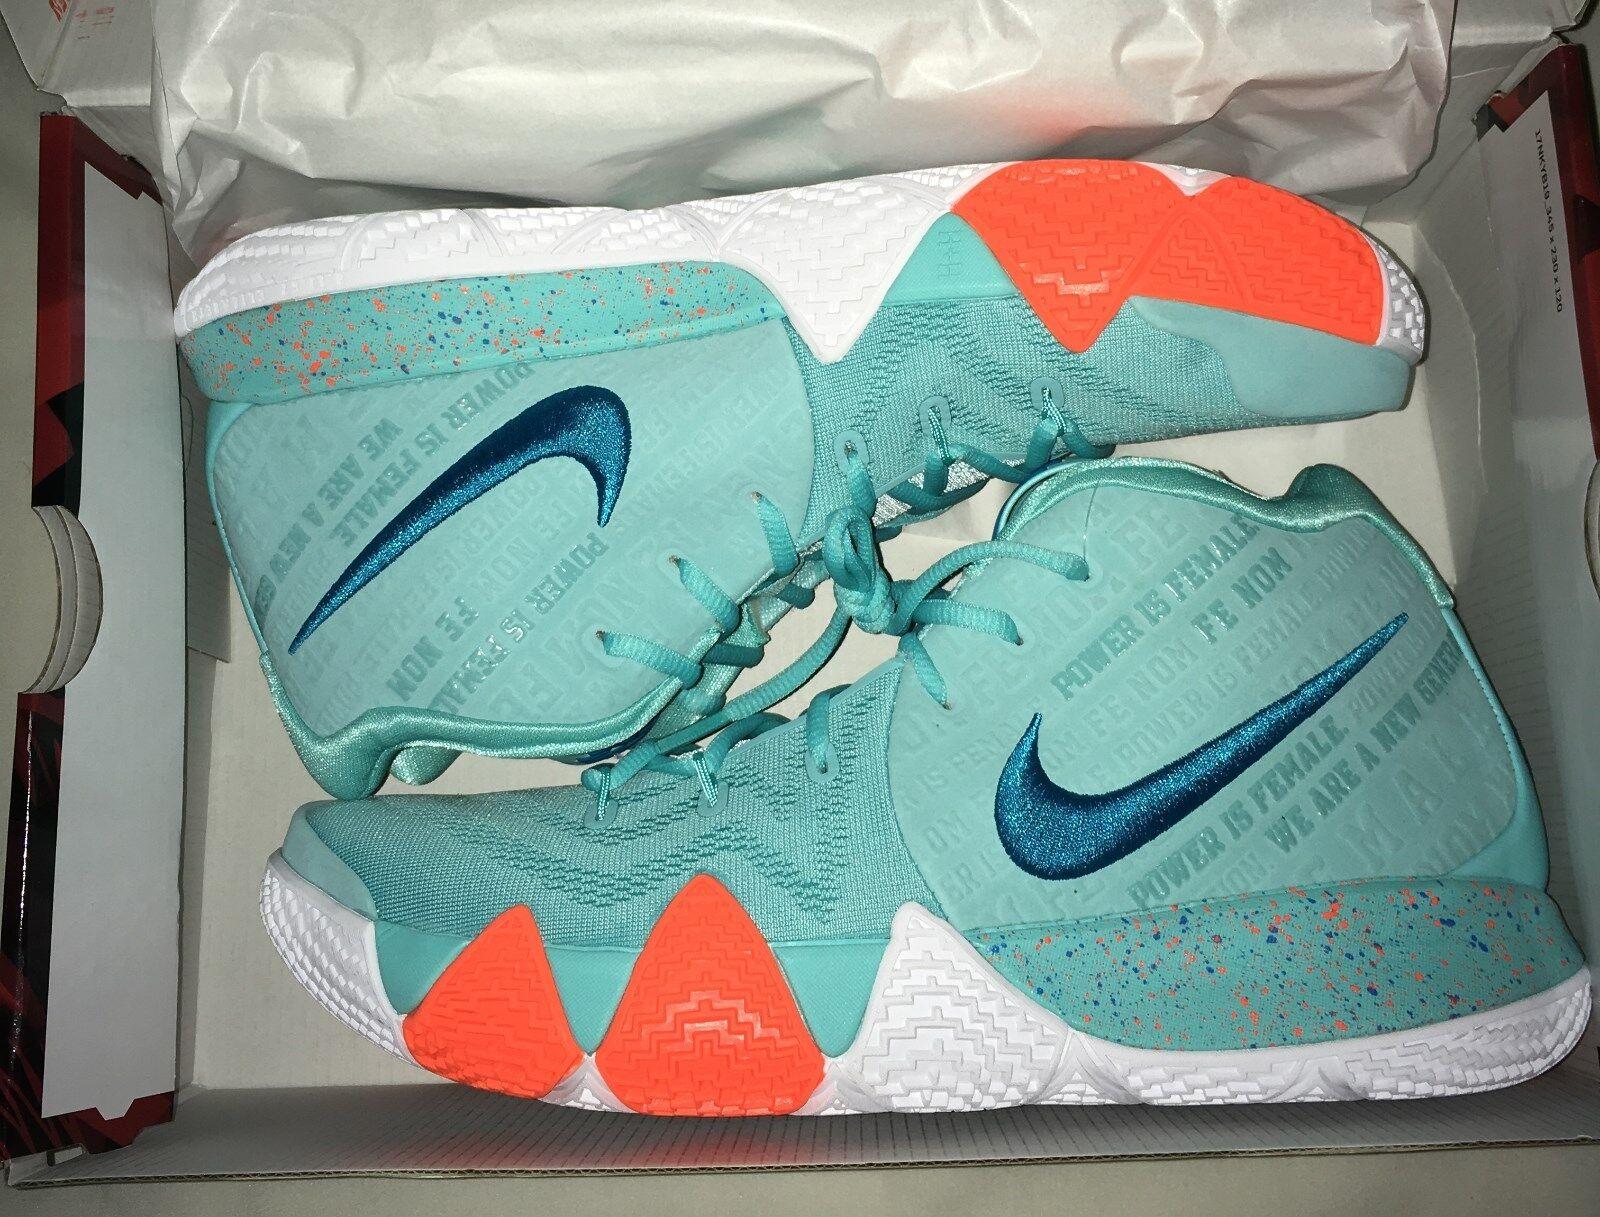 Nike Kyrie 4 IV Power is Female Light Aqua Neo Turquoise Irving Mens SIZE 12 NIB